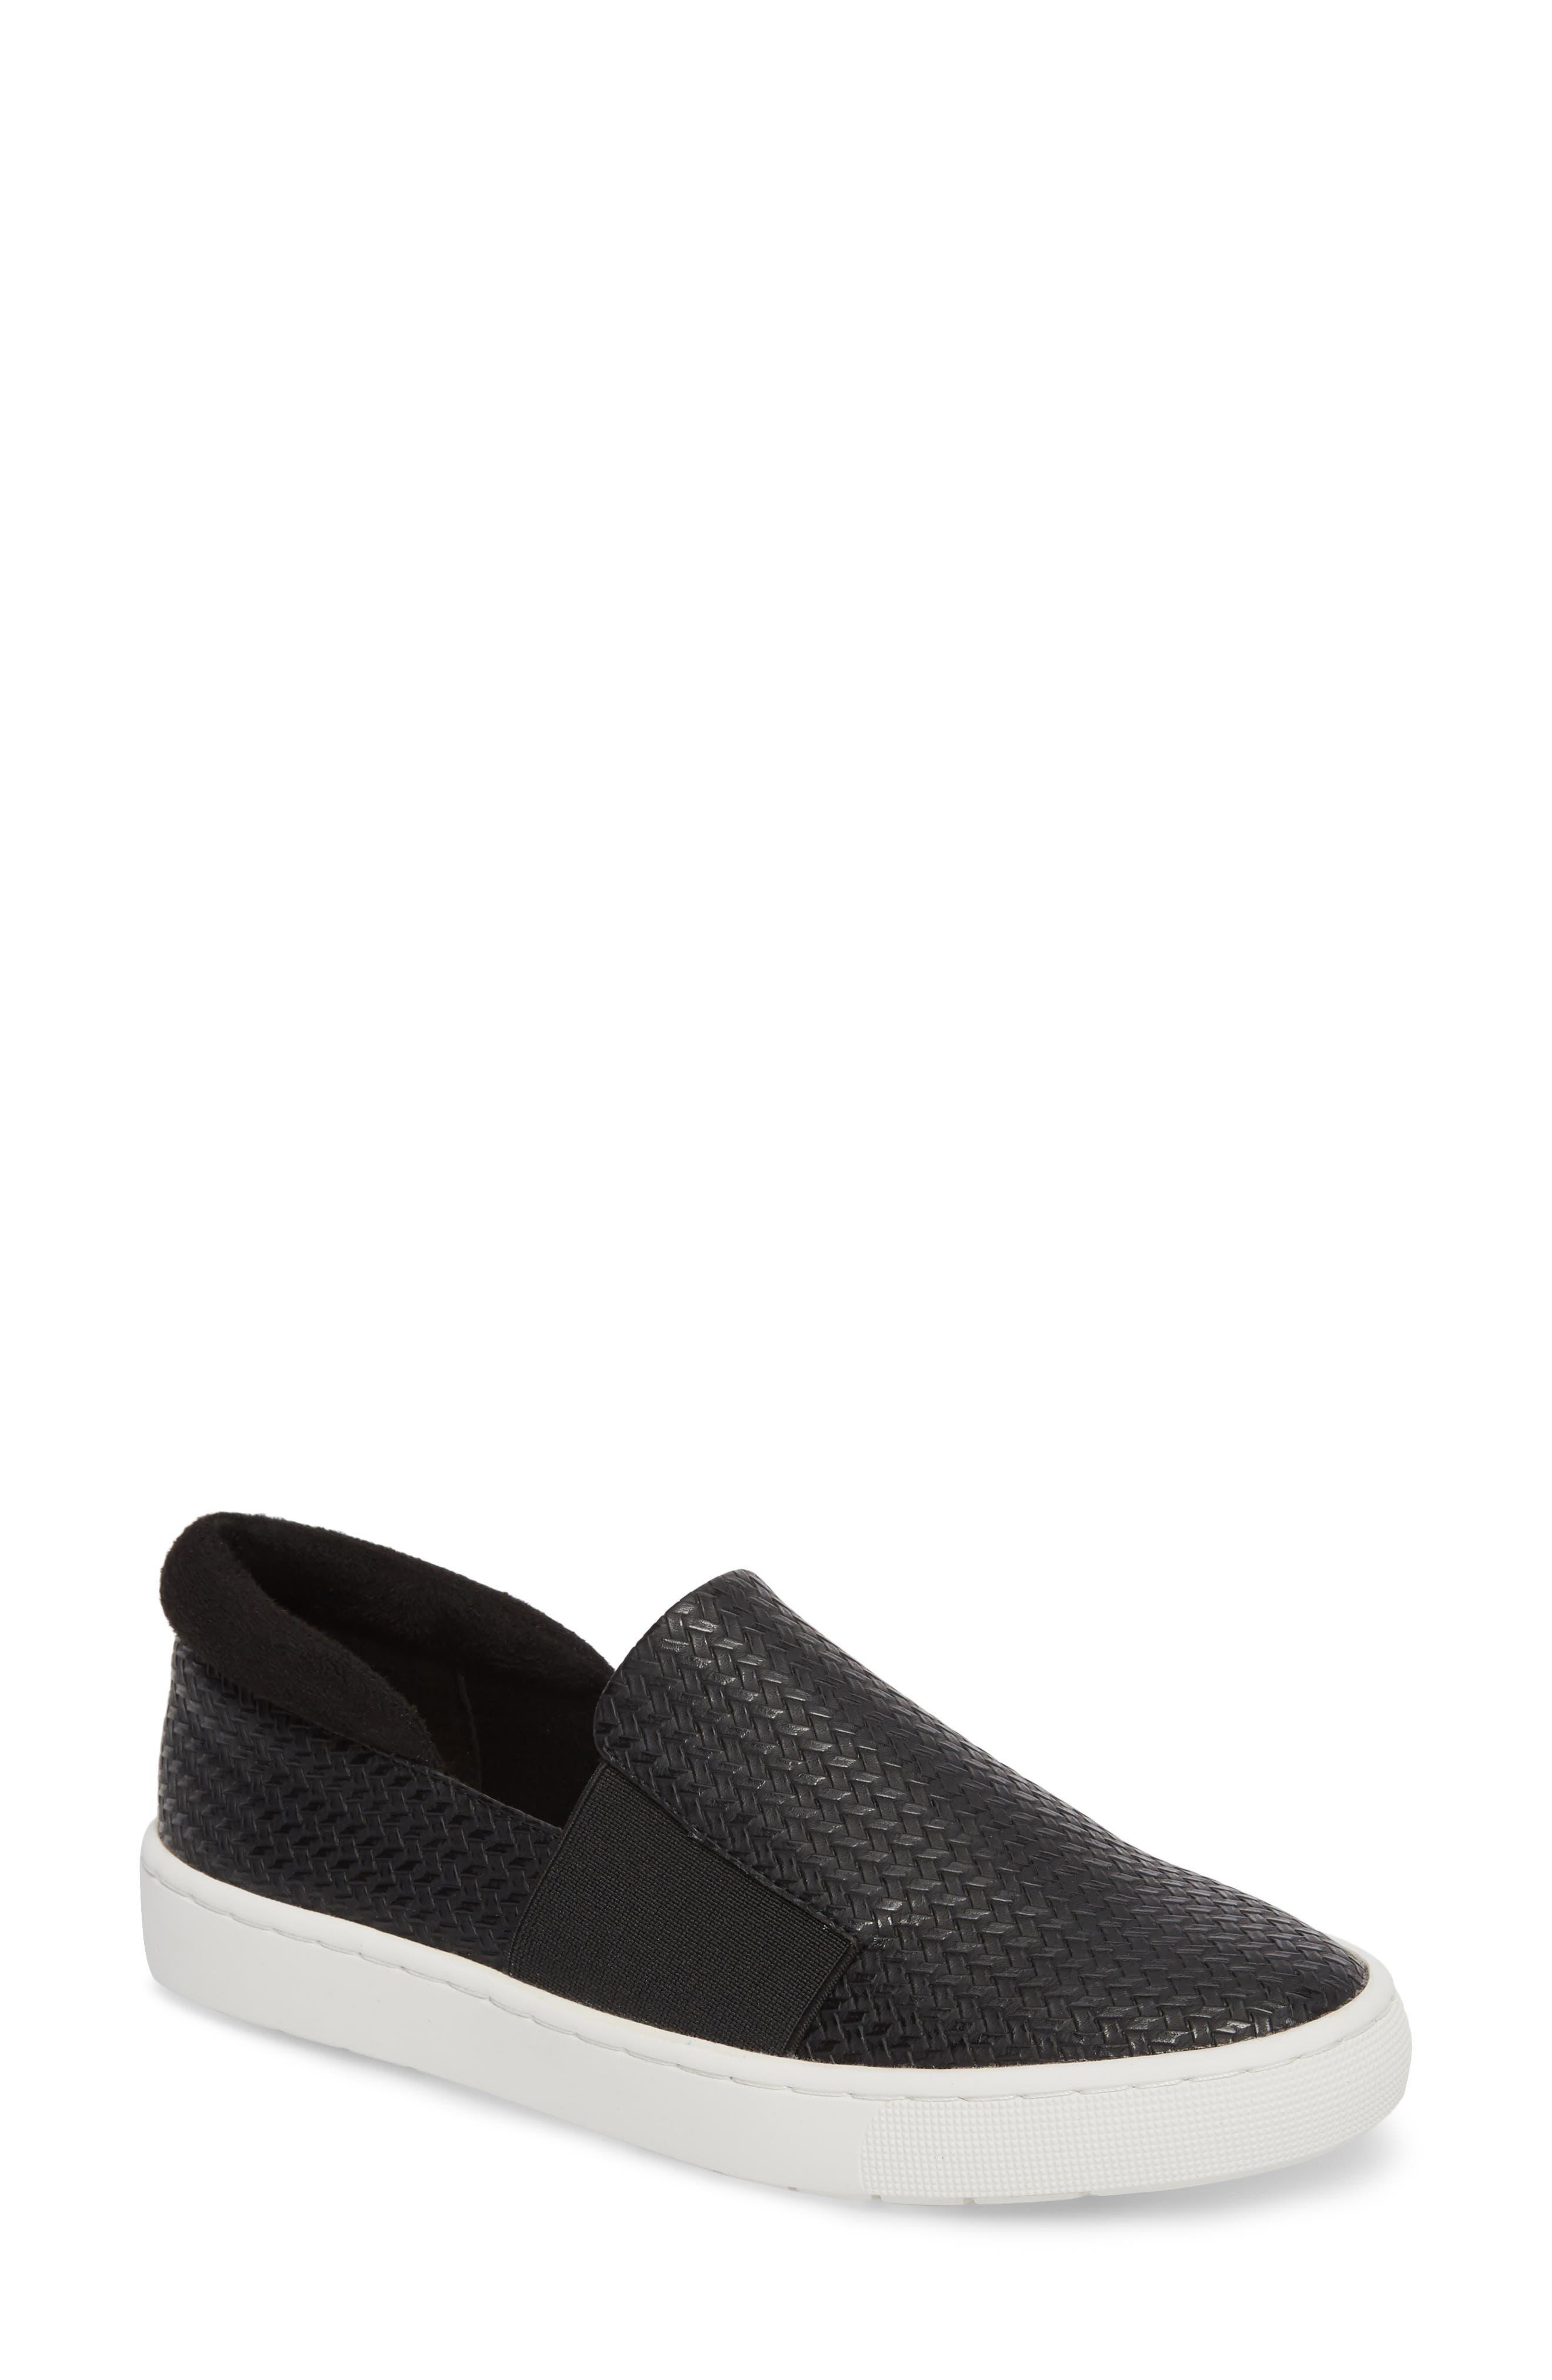 BELLA VITA Ramp II Slip-On Sneaker, Main, color, BLACK FABRIC